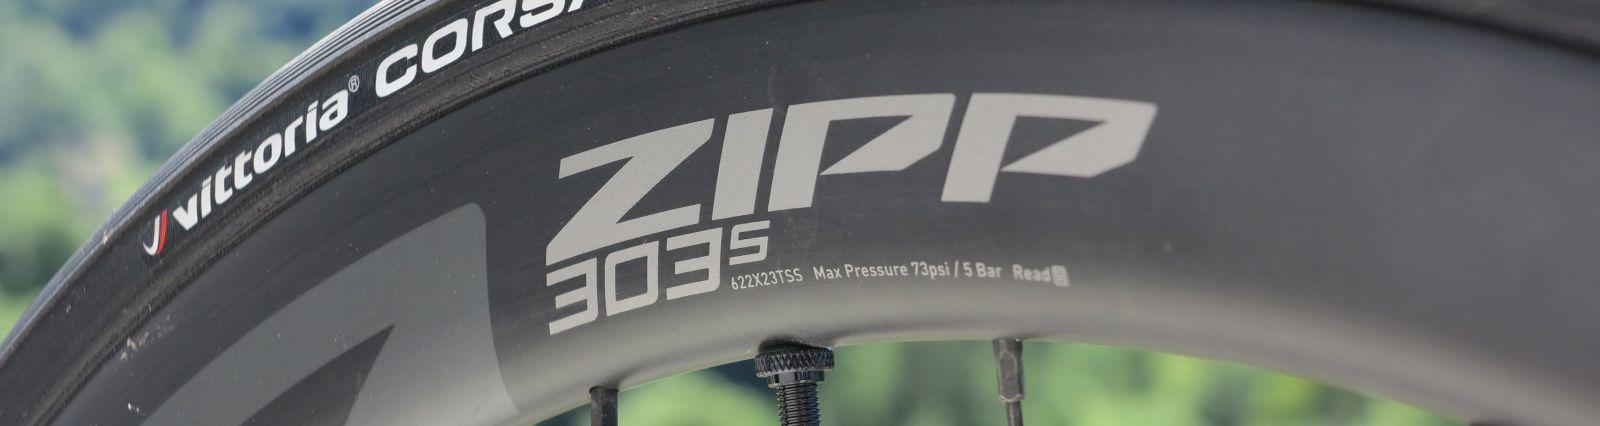 Blanc Domain Cycling Gel de Ruban de Guidon Extra Long pour v/élo de Route et v/élo